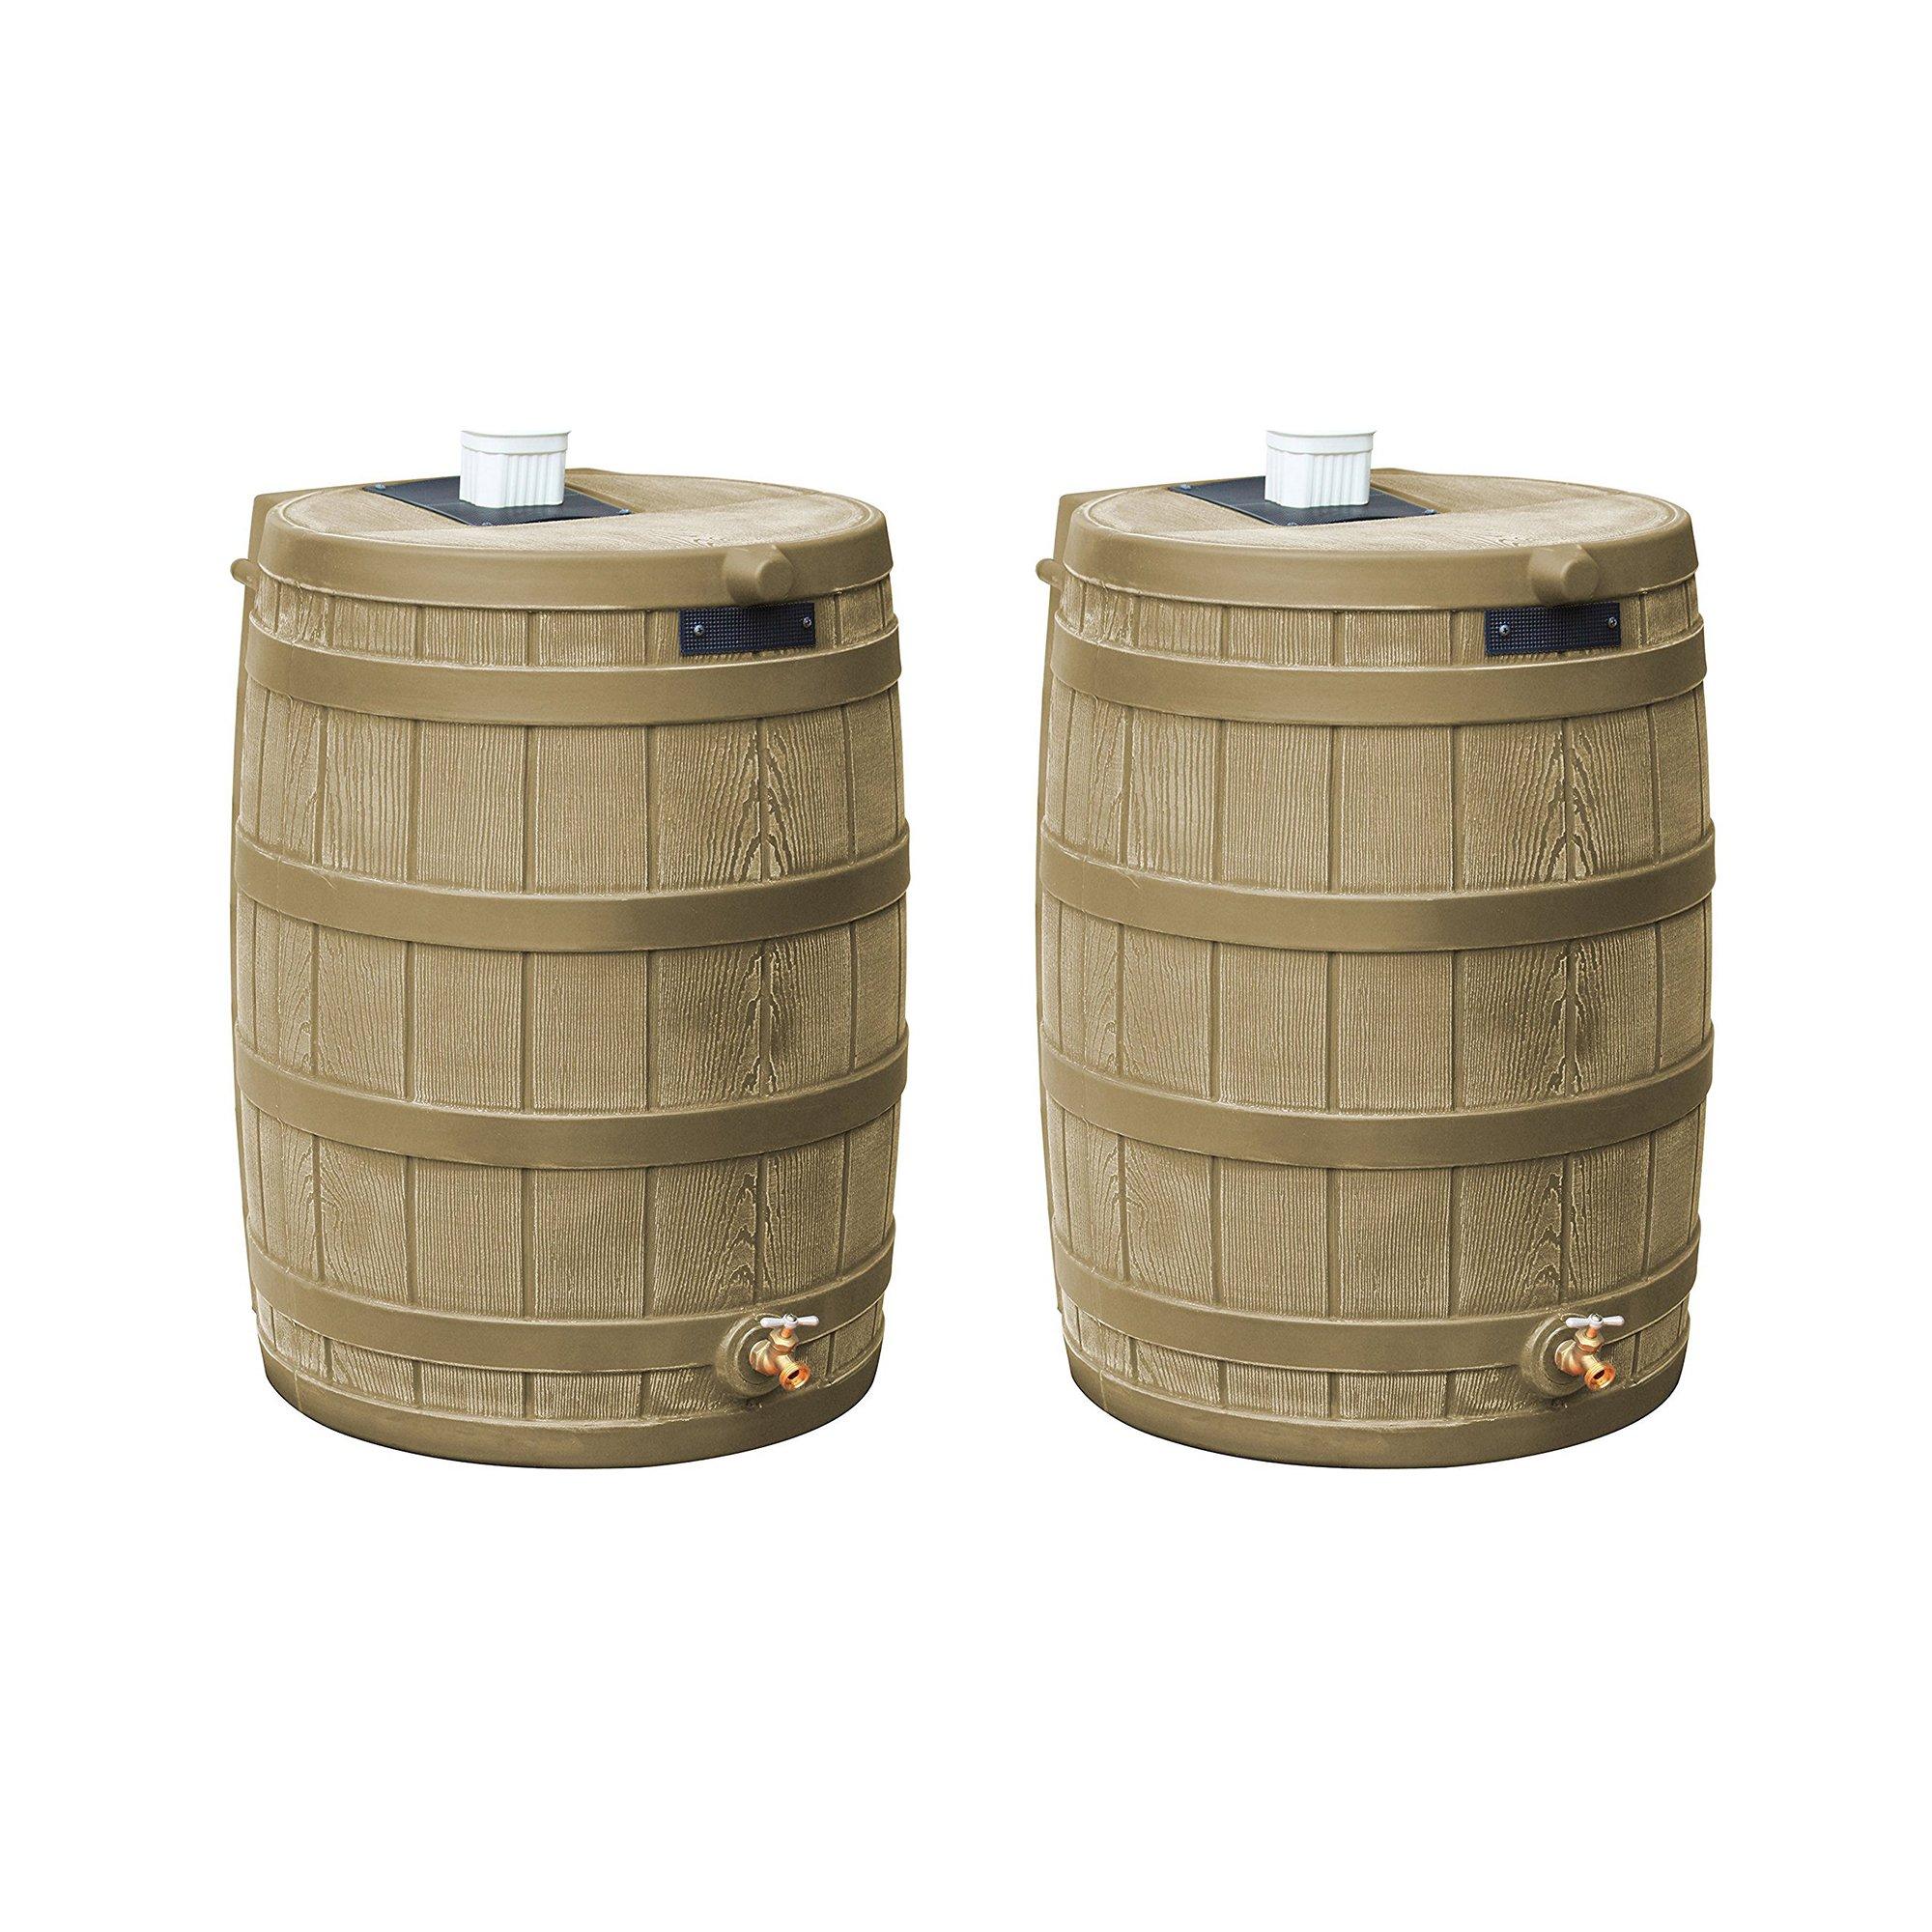 Good Ideas Rain Wizard 50 Gallon Plastic Water Collection Barrel, Khaki (2 Pack)